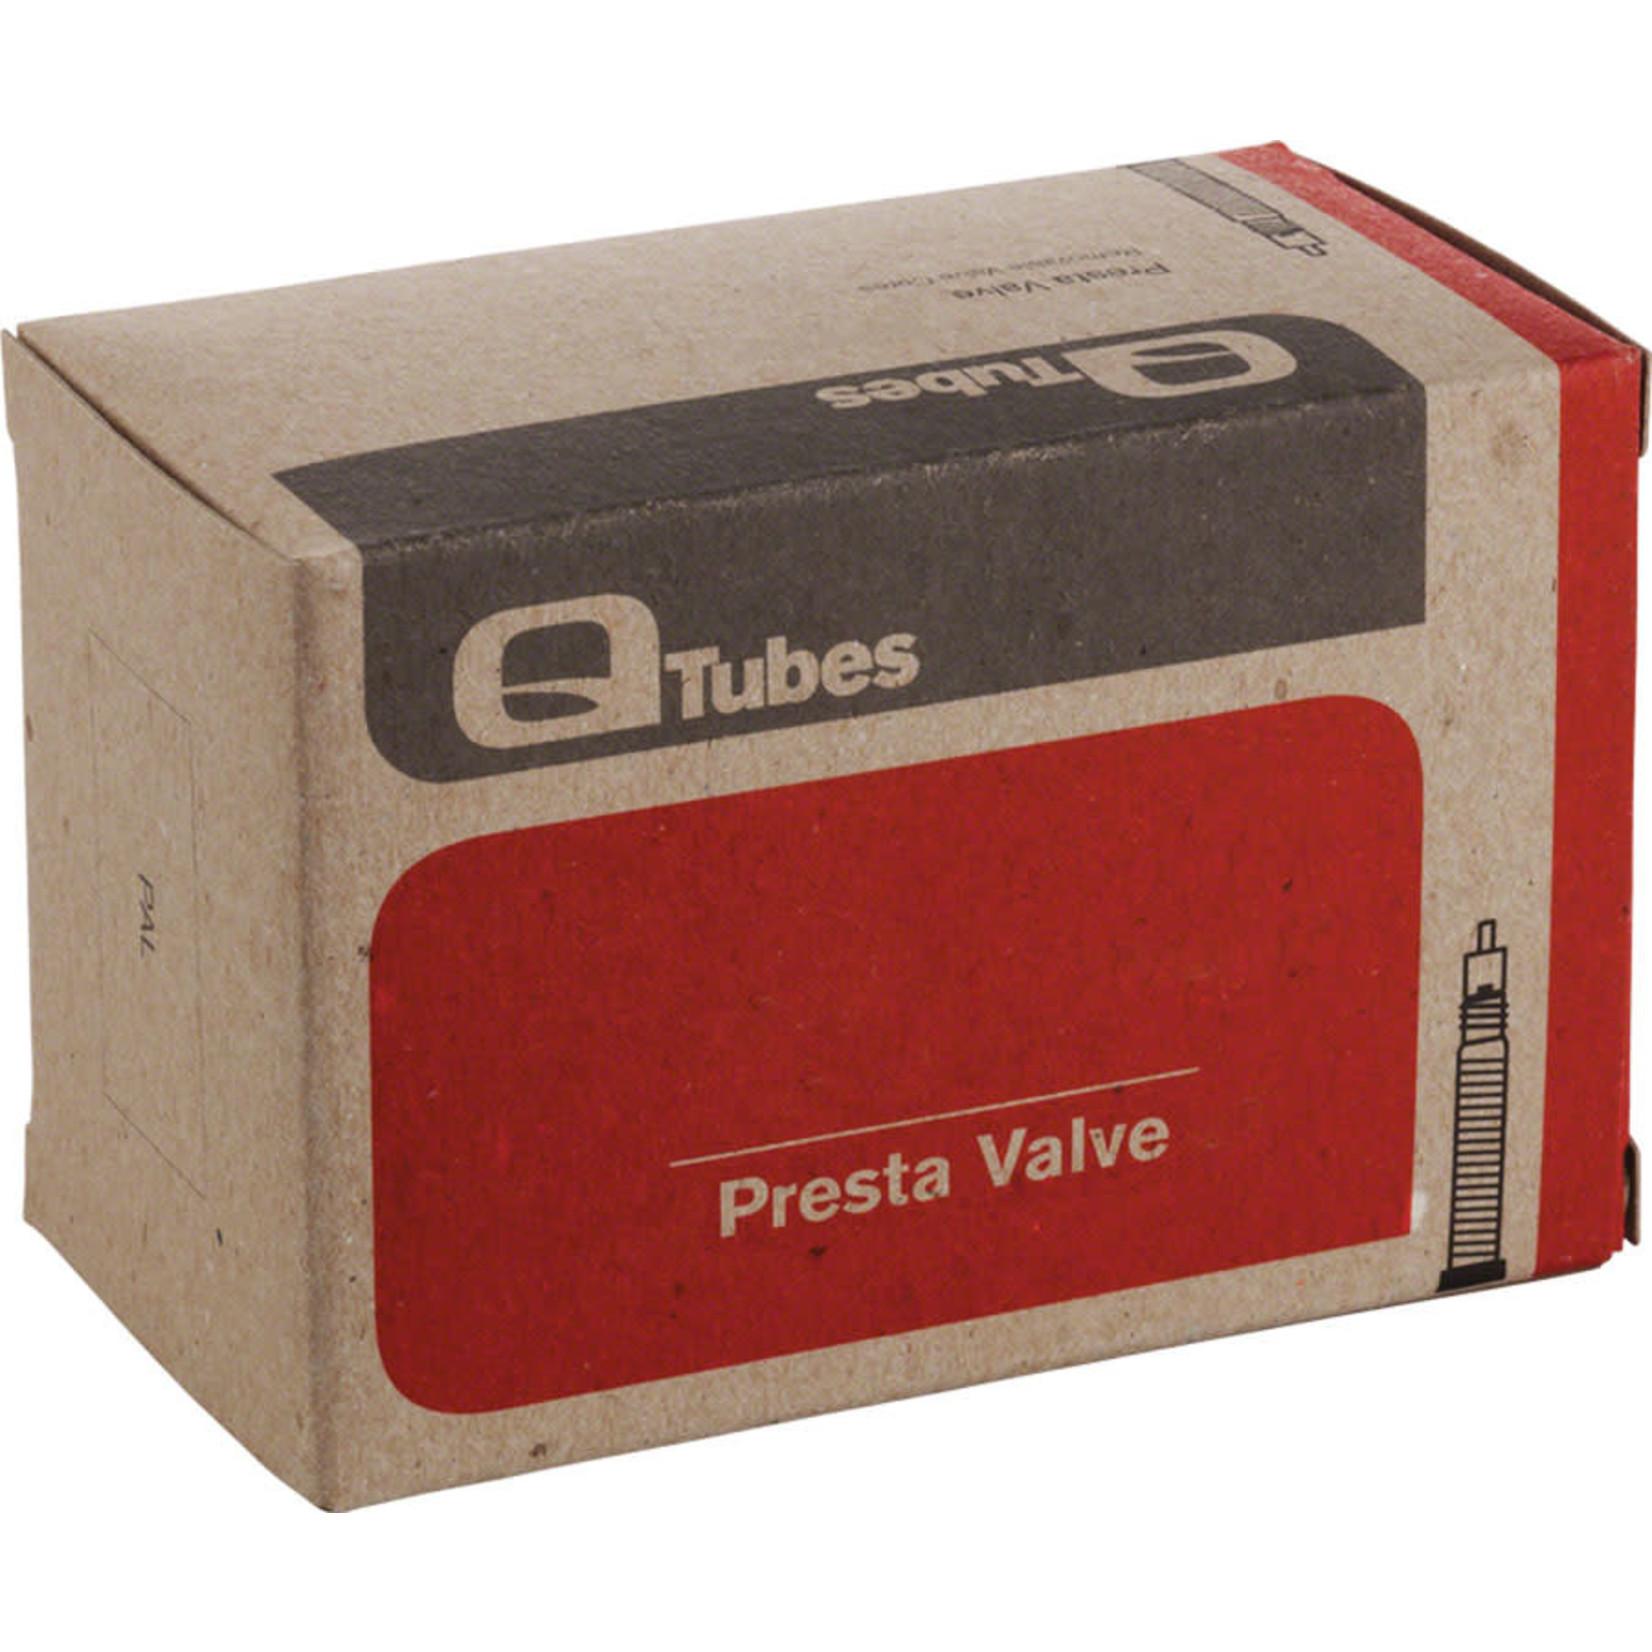 "Q-Tubes Q-Tubes Value Series Tube with 48mm Presta Valve: 27.5"" x 1.75-2.125"""